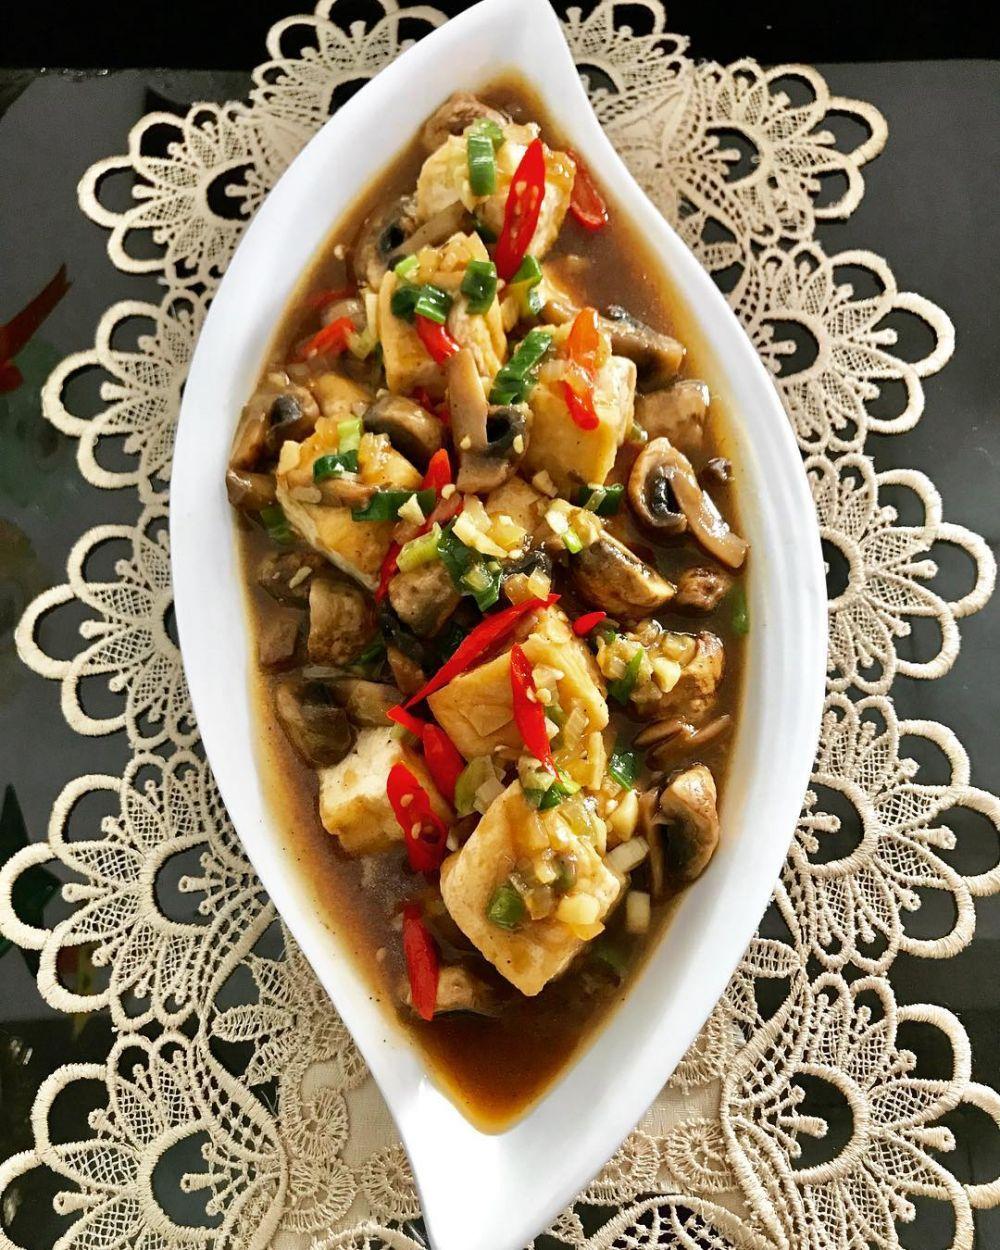 resep jamur kancing berbagai sumber